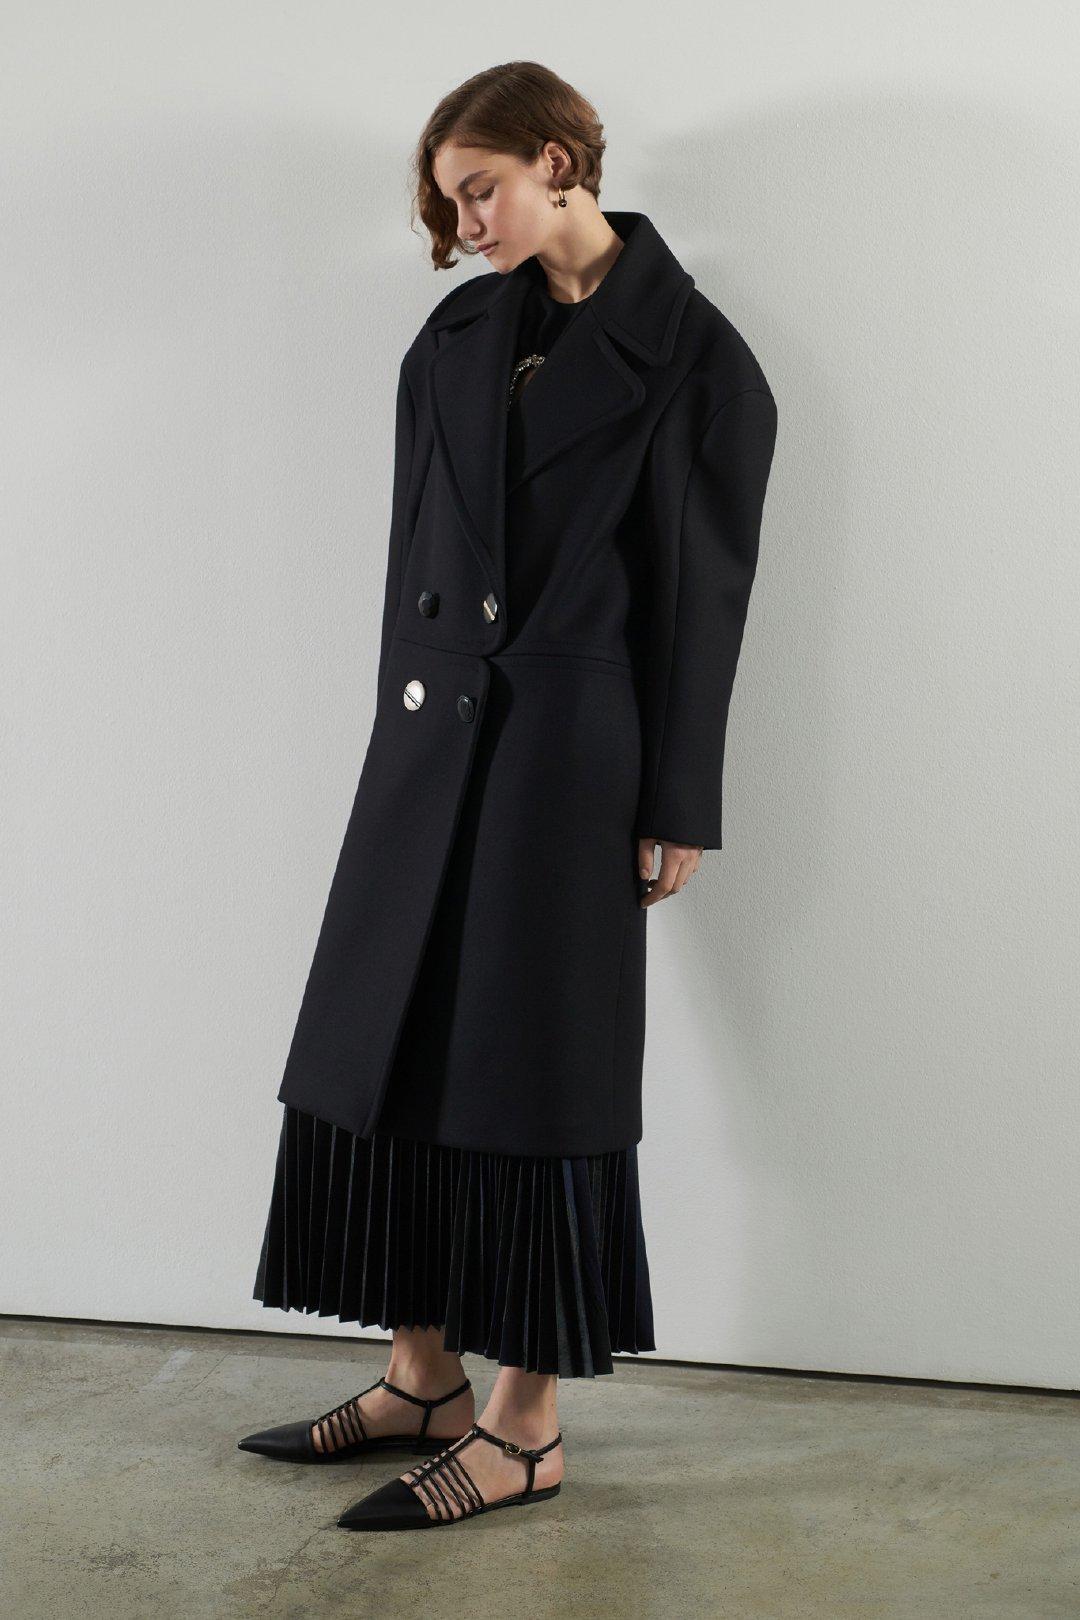 Stella McCartney 2020早秋系列厚重宽松的大轮廓因为高级质感的面料